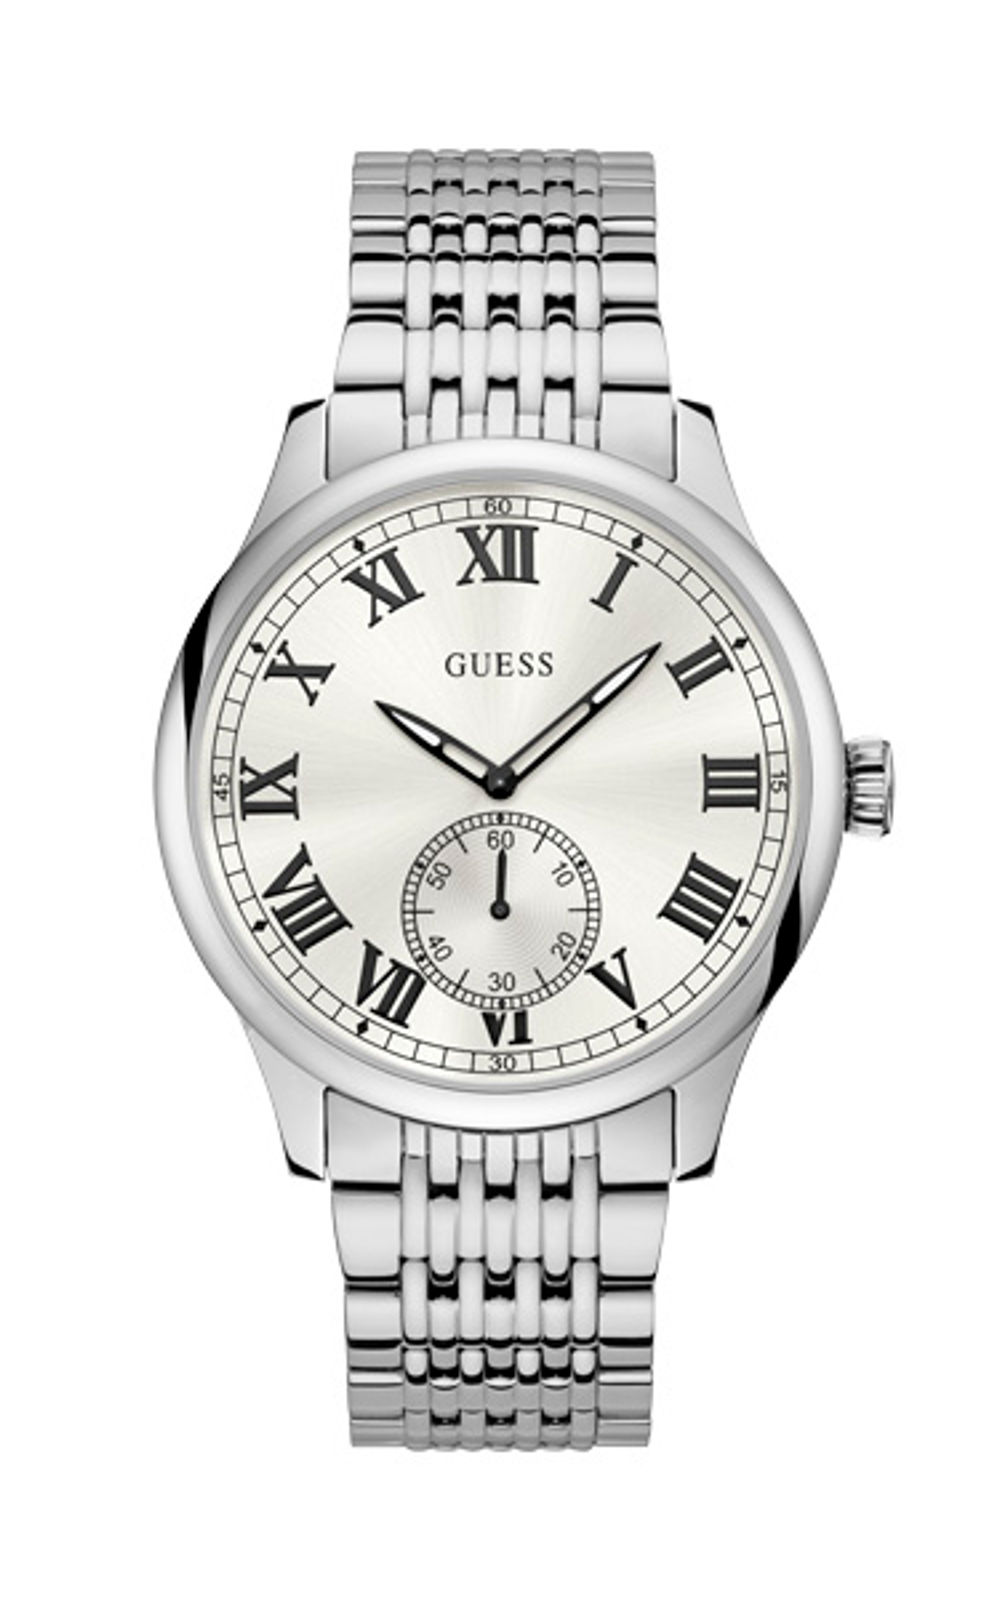 GUESS W1078G1 Ανδρικό Ρολόι Quartz Ακριβείας